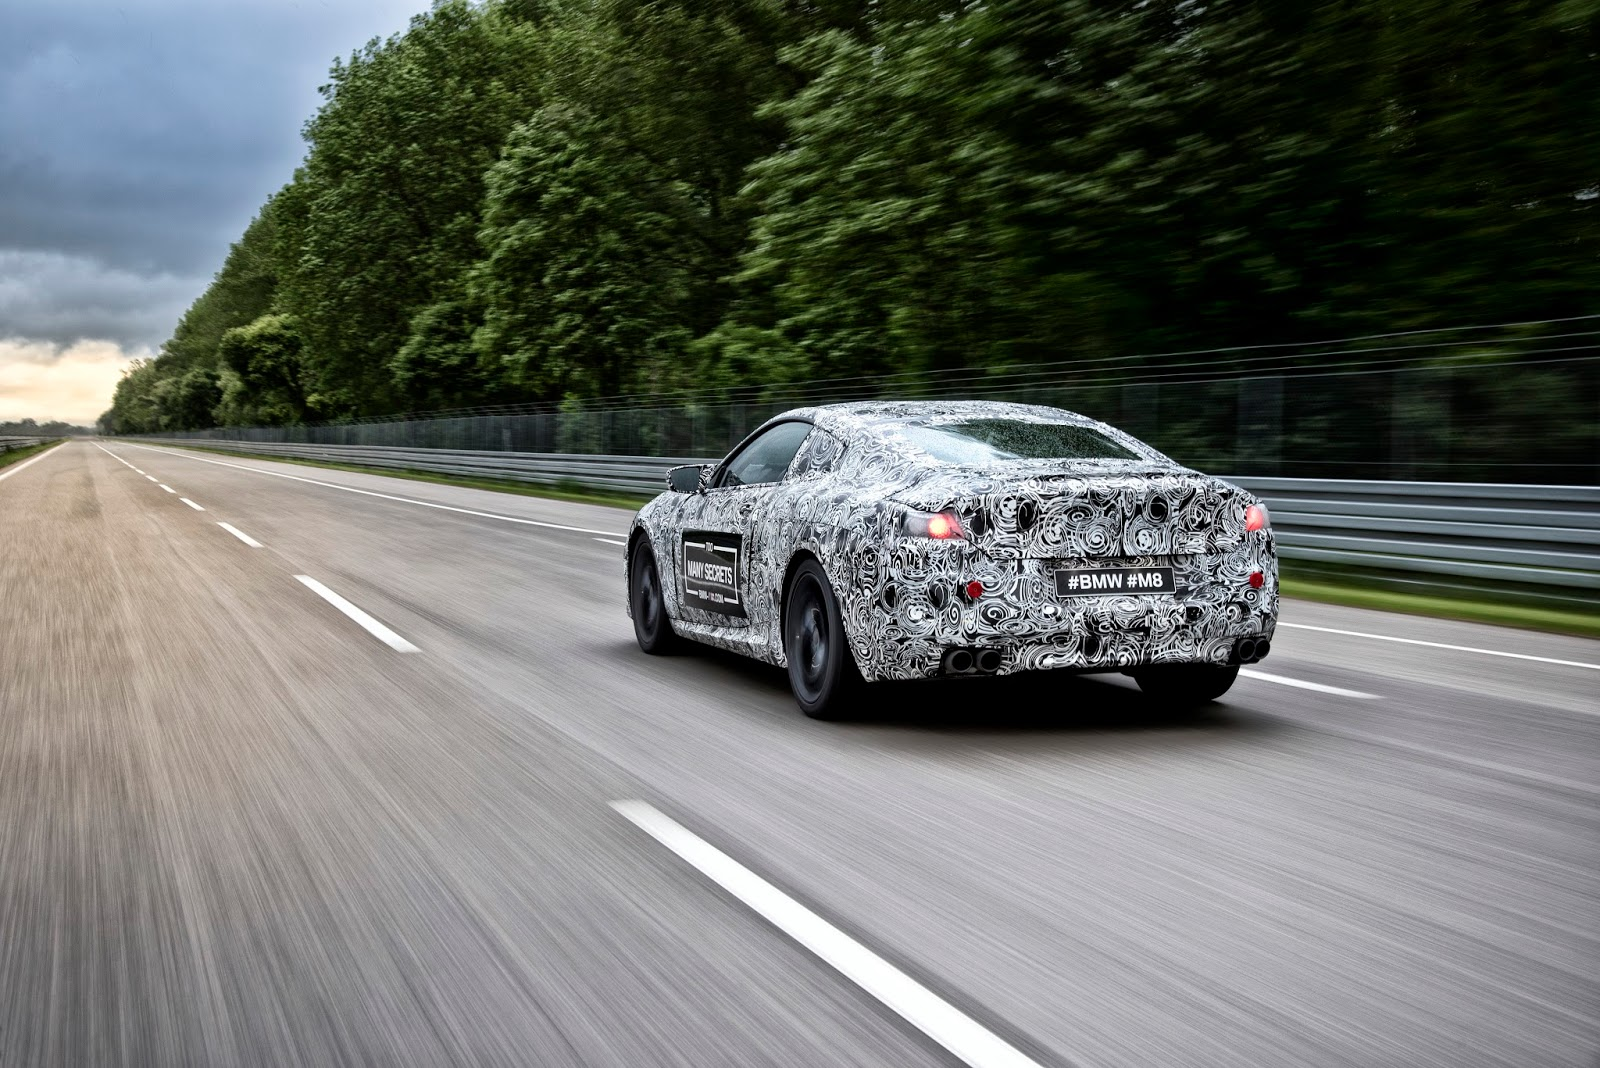 P90260949 highRes bmw m8 prototype 05 1 1 H ναυαρχίδα της BMW, η M8 θα είναι οκτακύλινδρη BMW, BMW Concept, BMW Concept 8 Series, BMW M, BMW M Performance, BMW M8